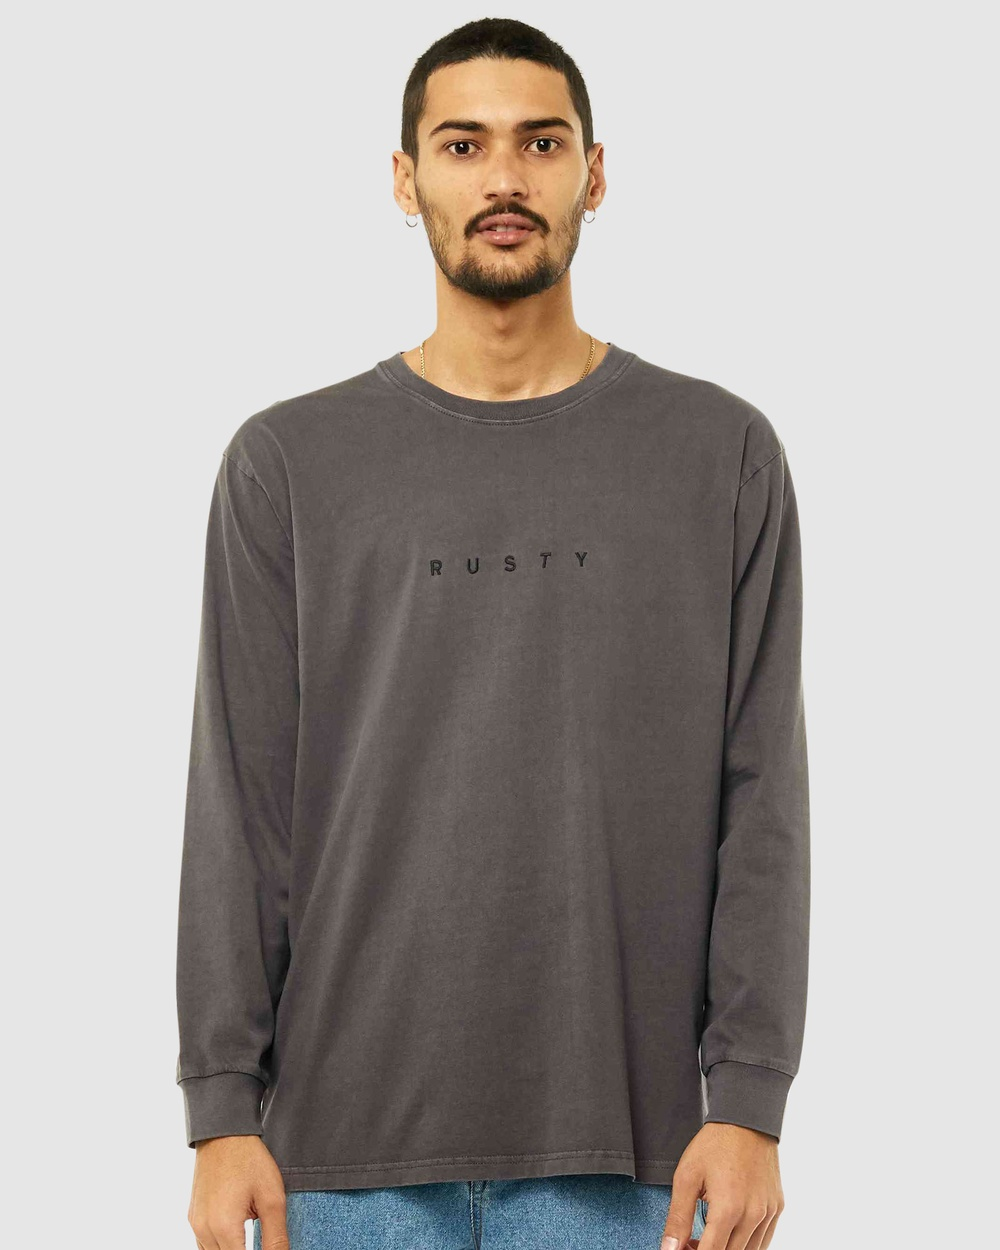 Rusty - Special Cut Long Sleeve Tee - Long Sleeve T-Shirts (COA) Special Cut Long Sleeve Tee